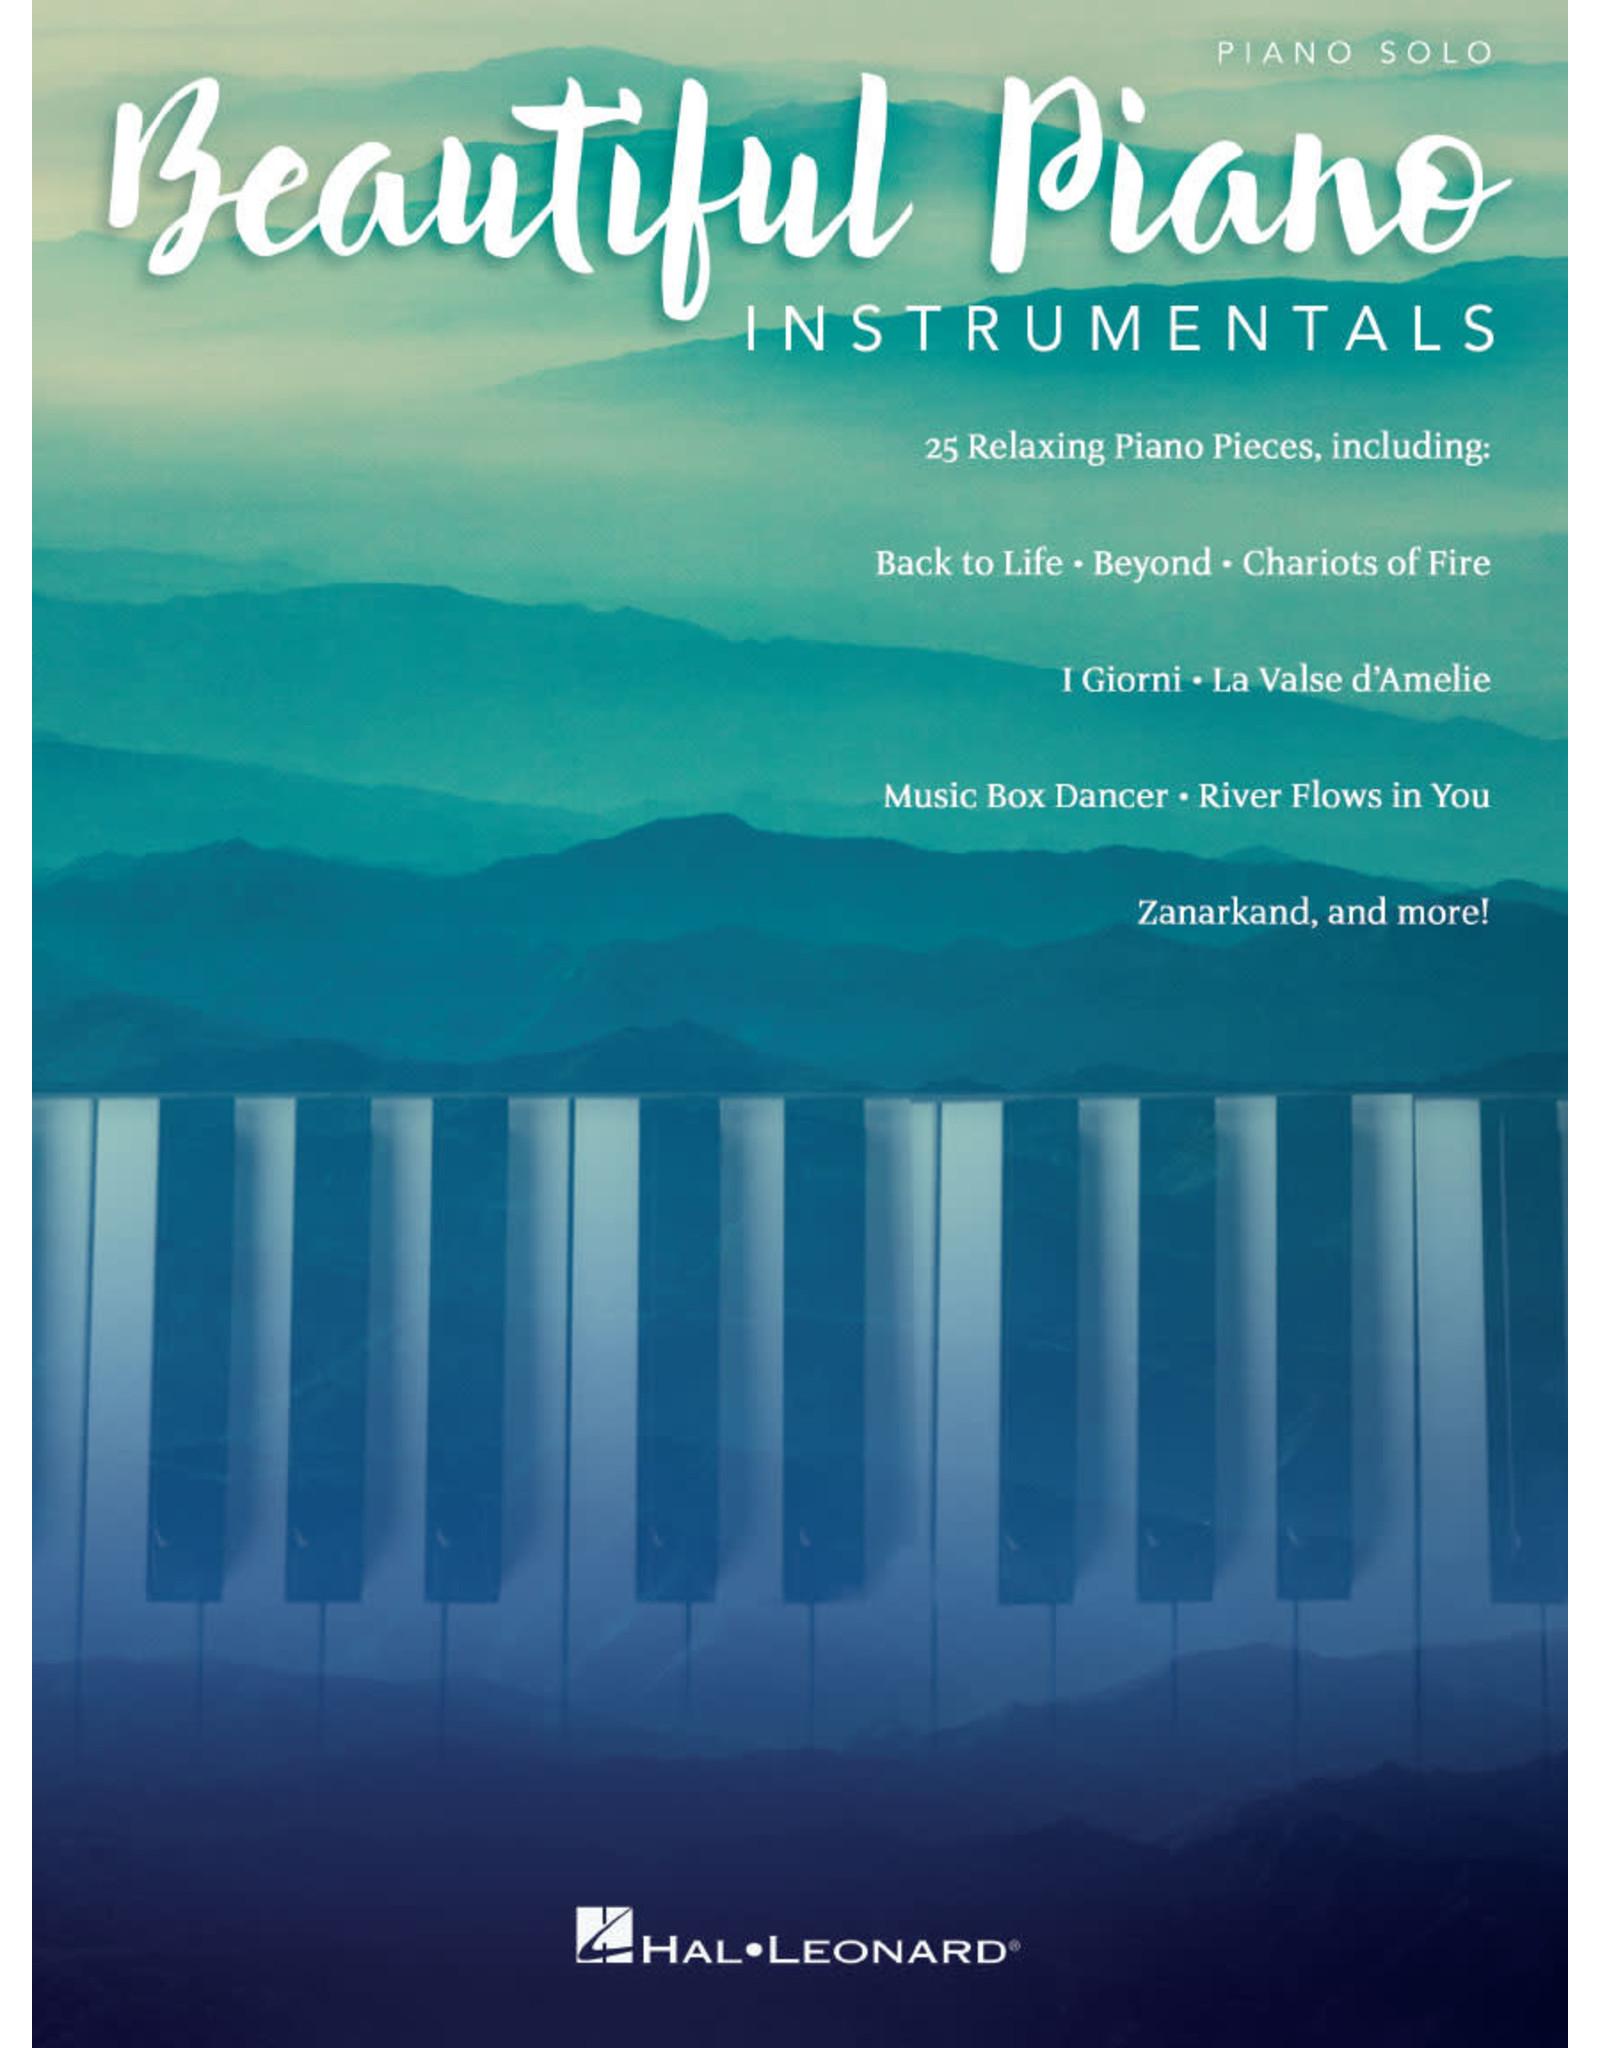 Hal Leonard Beautiful Piano Instrumentals - PIano Solo